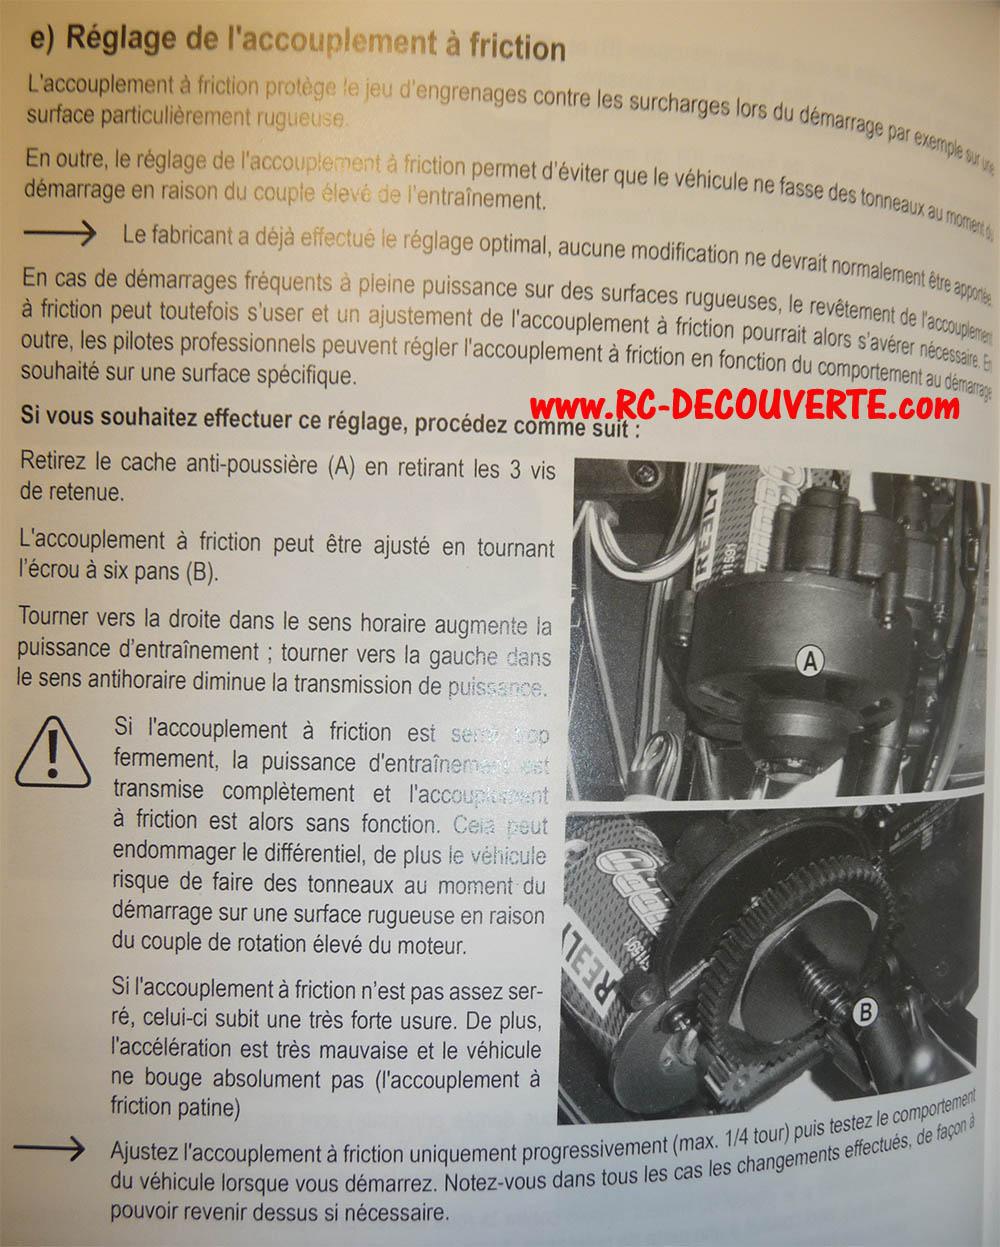 Crawler Reely Free Men Extreme RTR RE-6549612 VS Scx10 II : Présentation et modification by Louloux - Page 2 Reely-35